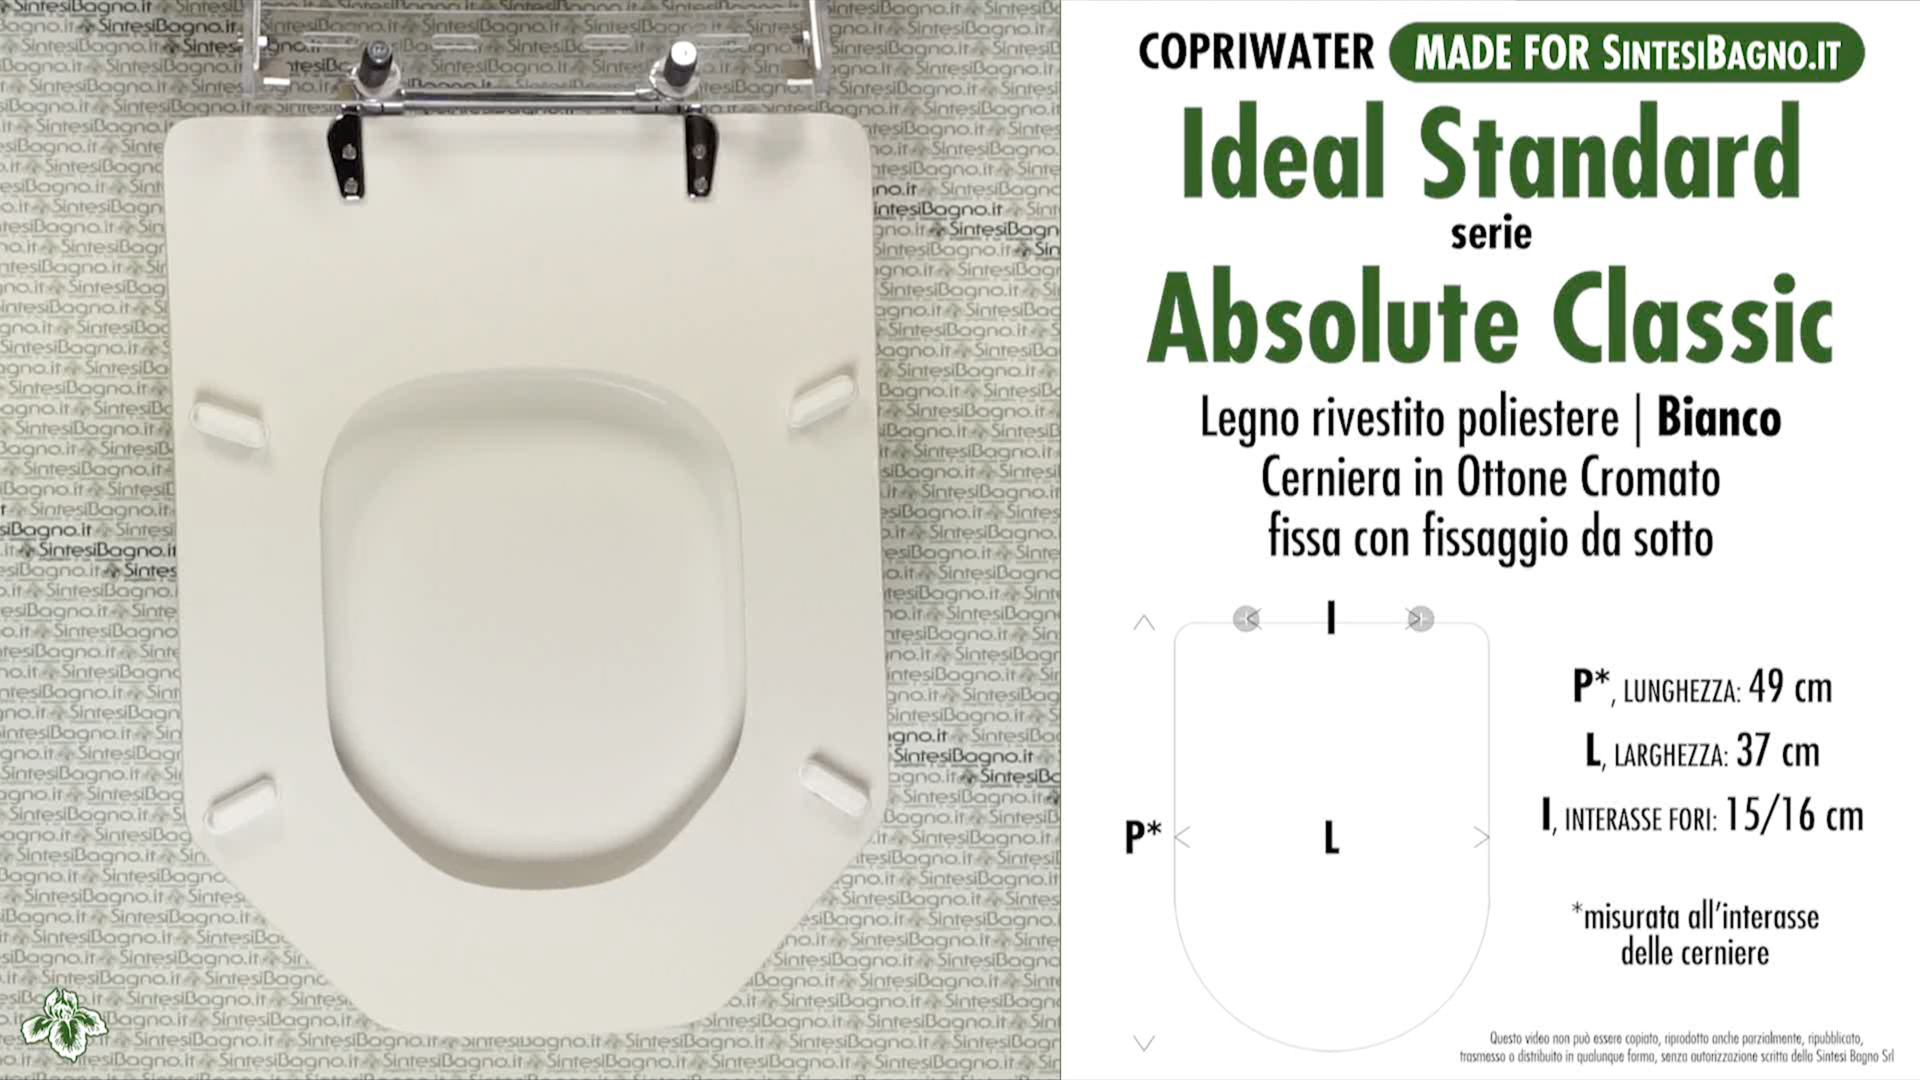 SCHEDA TECNICA MISURE copriwater IDEAL STANDARD ABSOLUTE CLASSIC